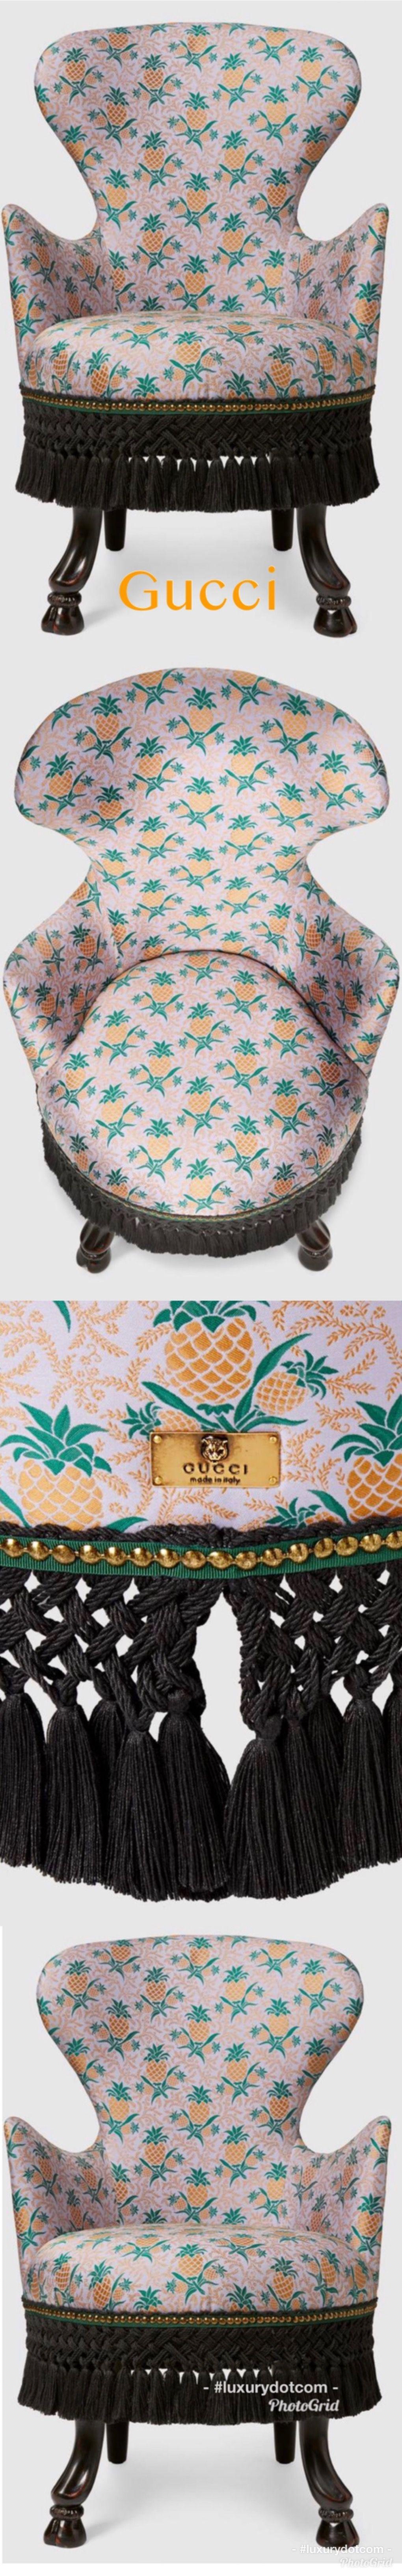 "d0b97b3f96970 Gucci 2019 2020 ""Worldly pleasures"" homeware designs and prints ..."